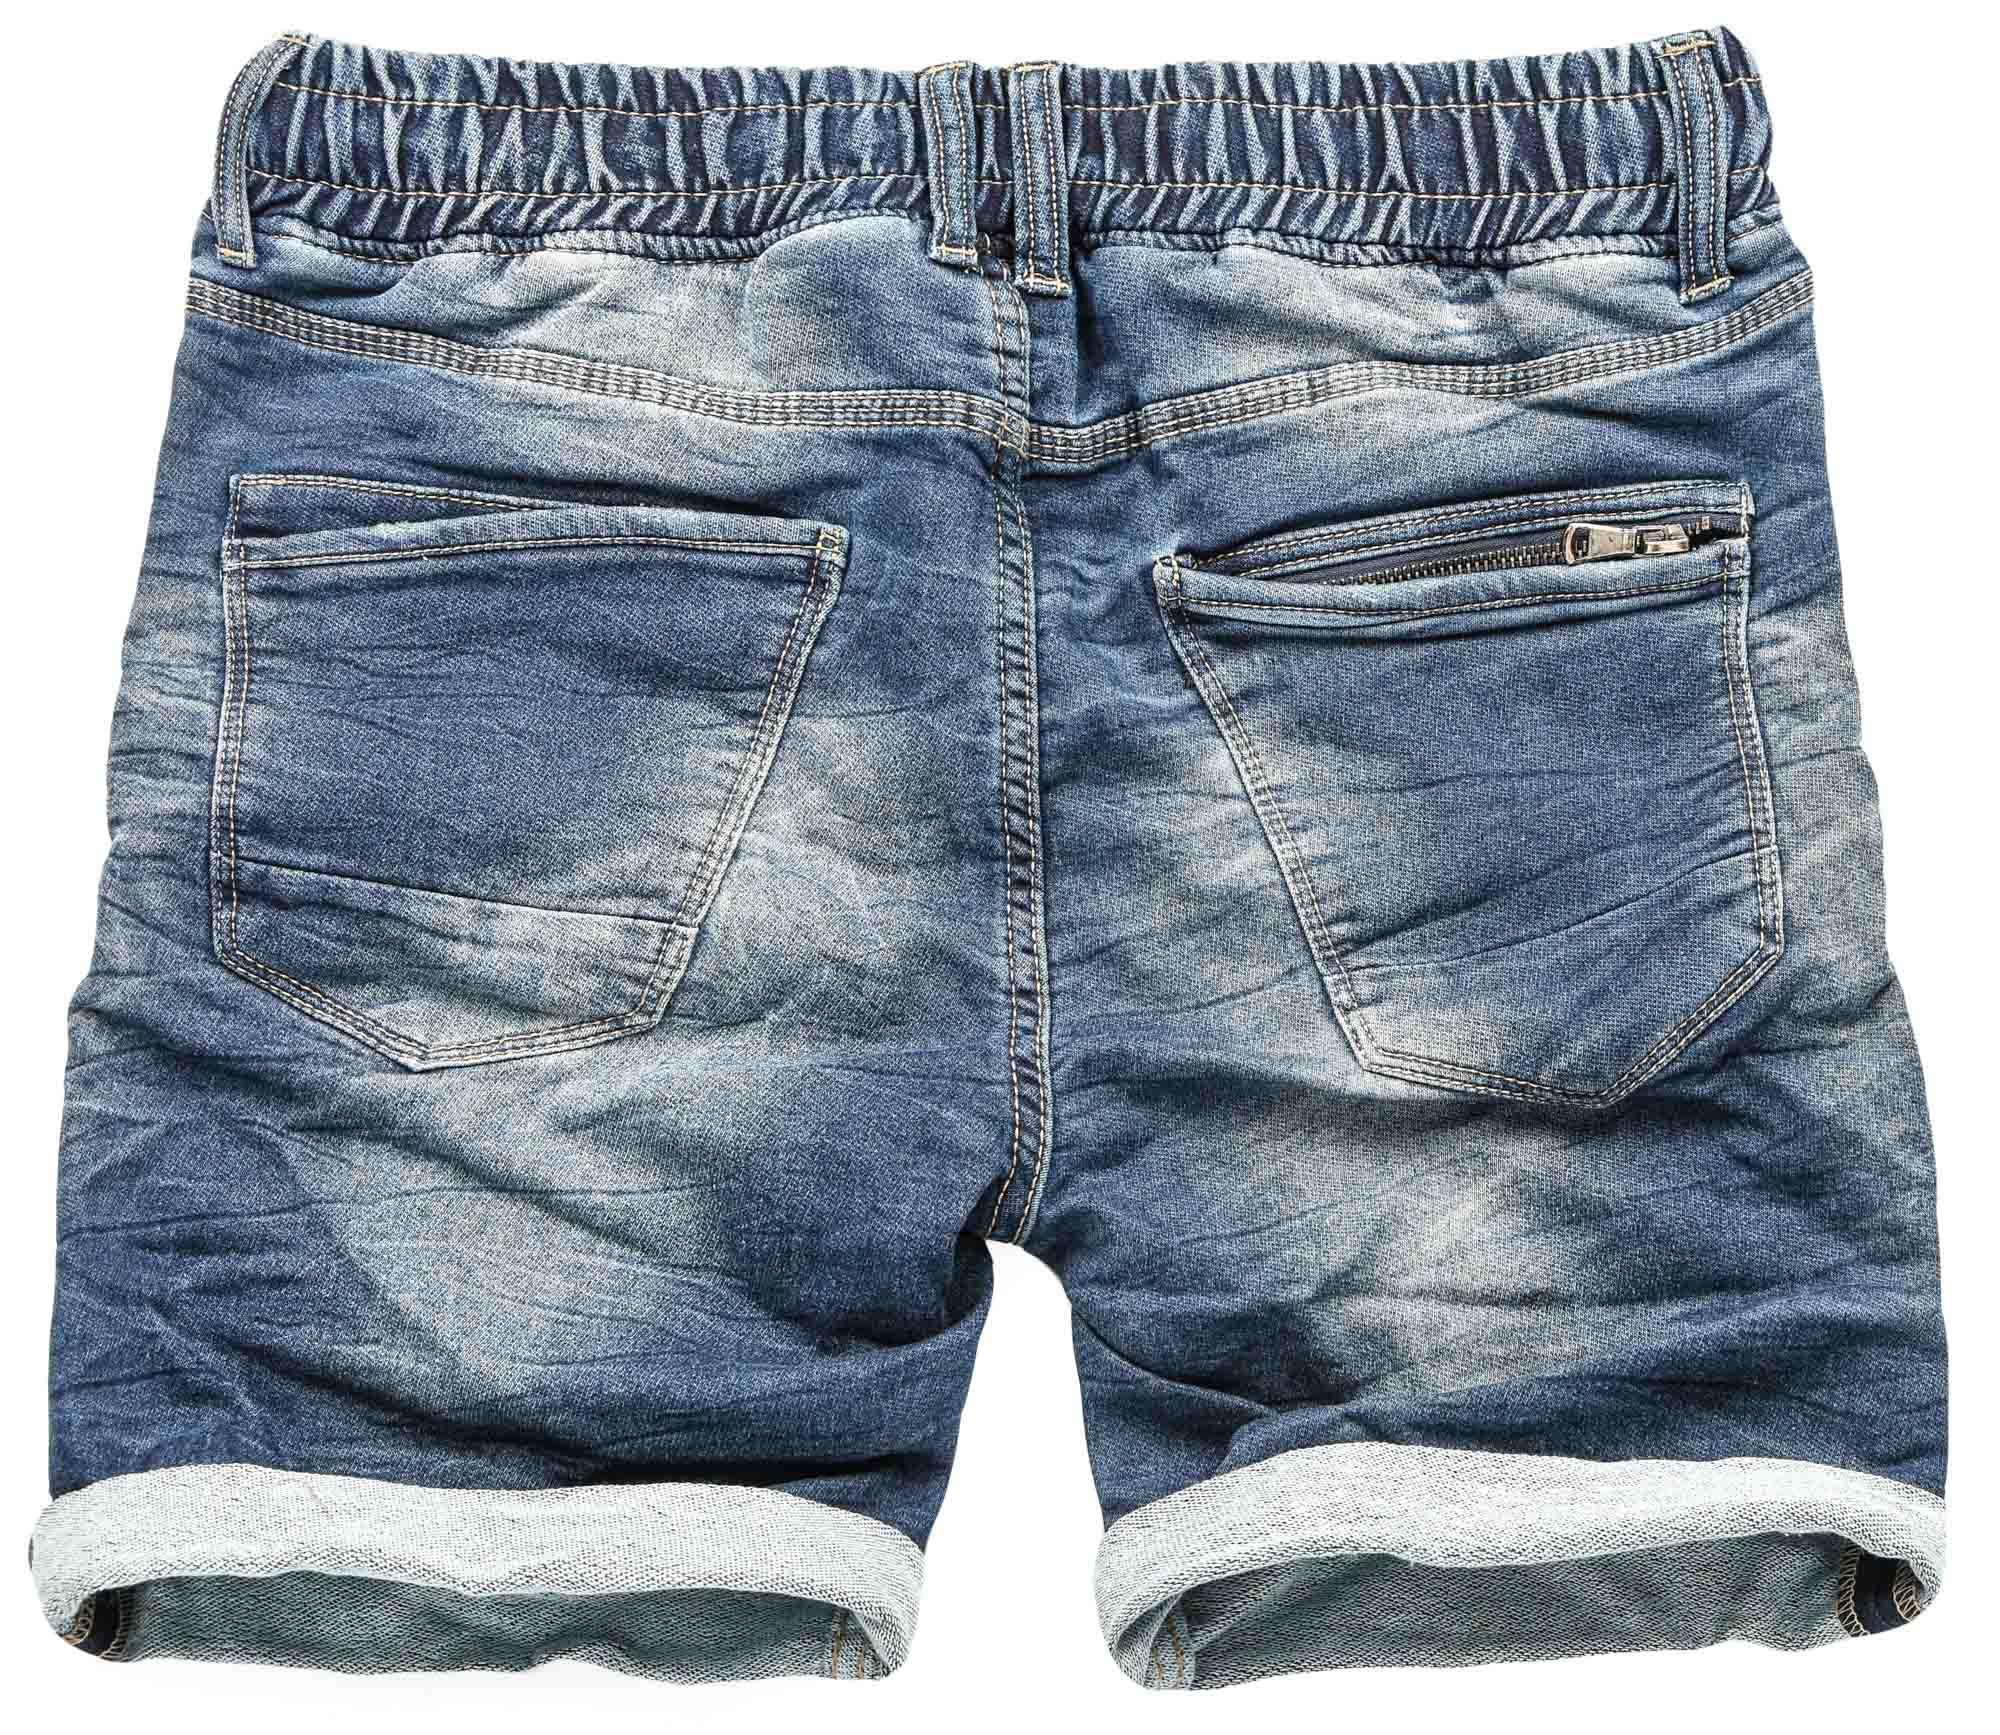 Sublevel-Herren-Sweat-Jeans-Shorts-kurze-Hose-Bermuda-Sommer-Sweathose-Slim-NEU Indexbild 27